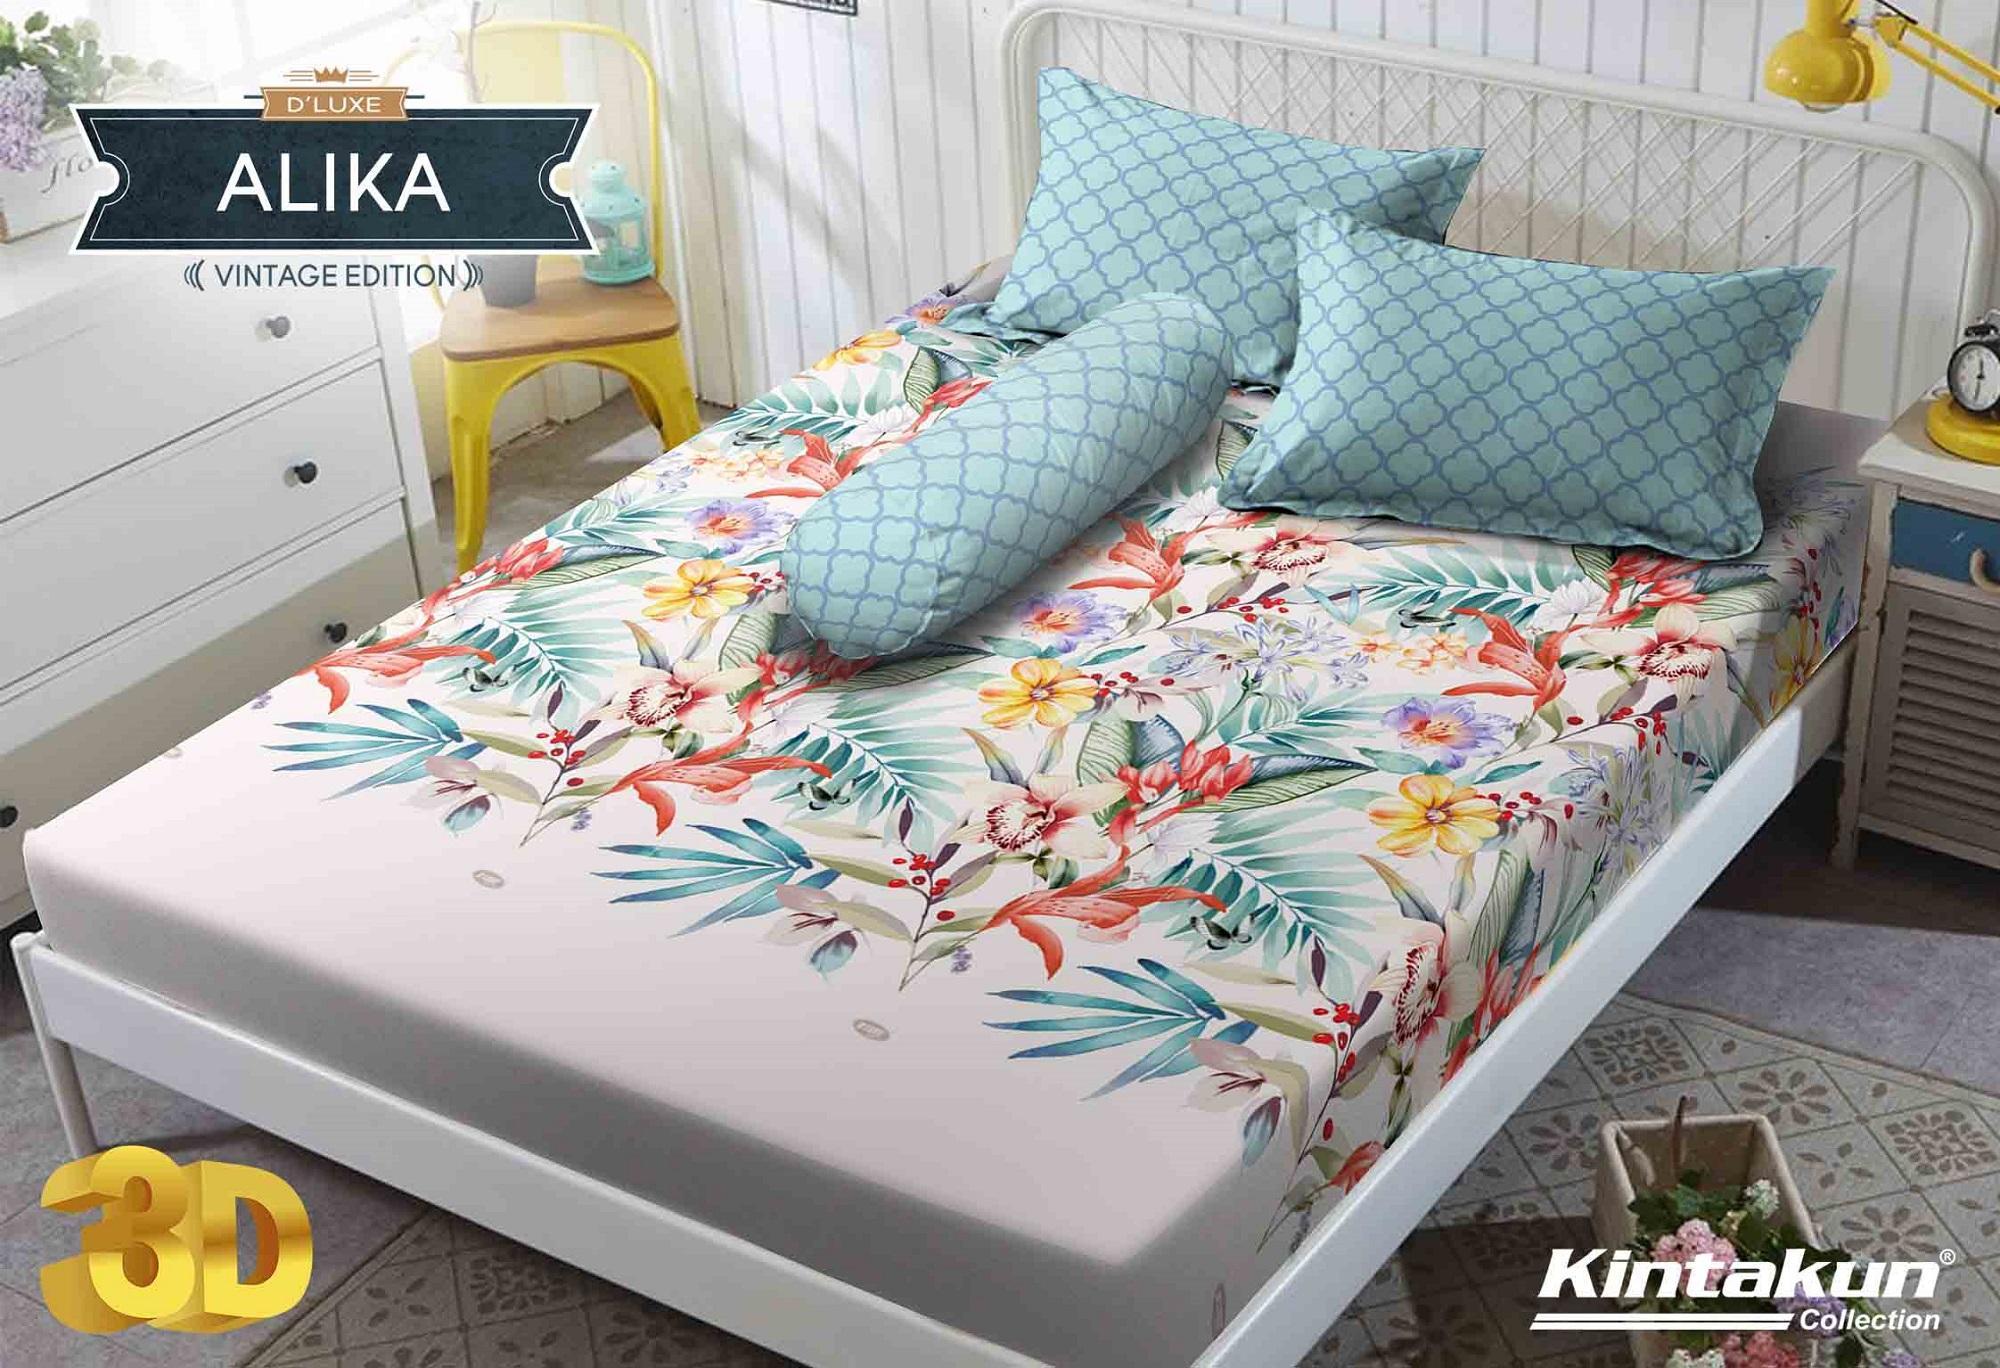 Sprei Kintakun DLuxe Single Size Vintage Edition Uk. 120x200 cm - Alika